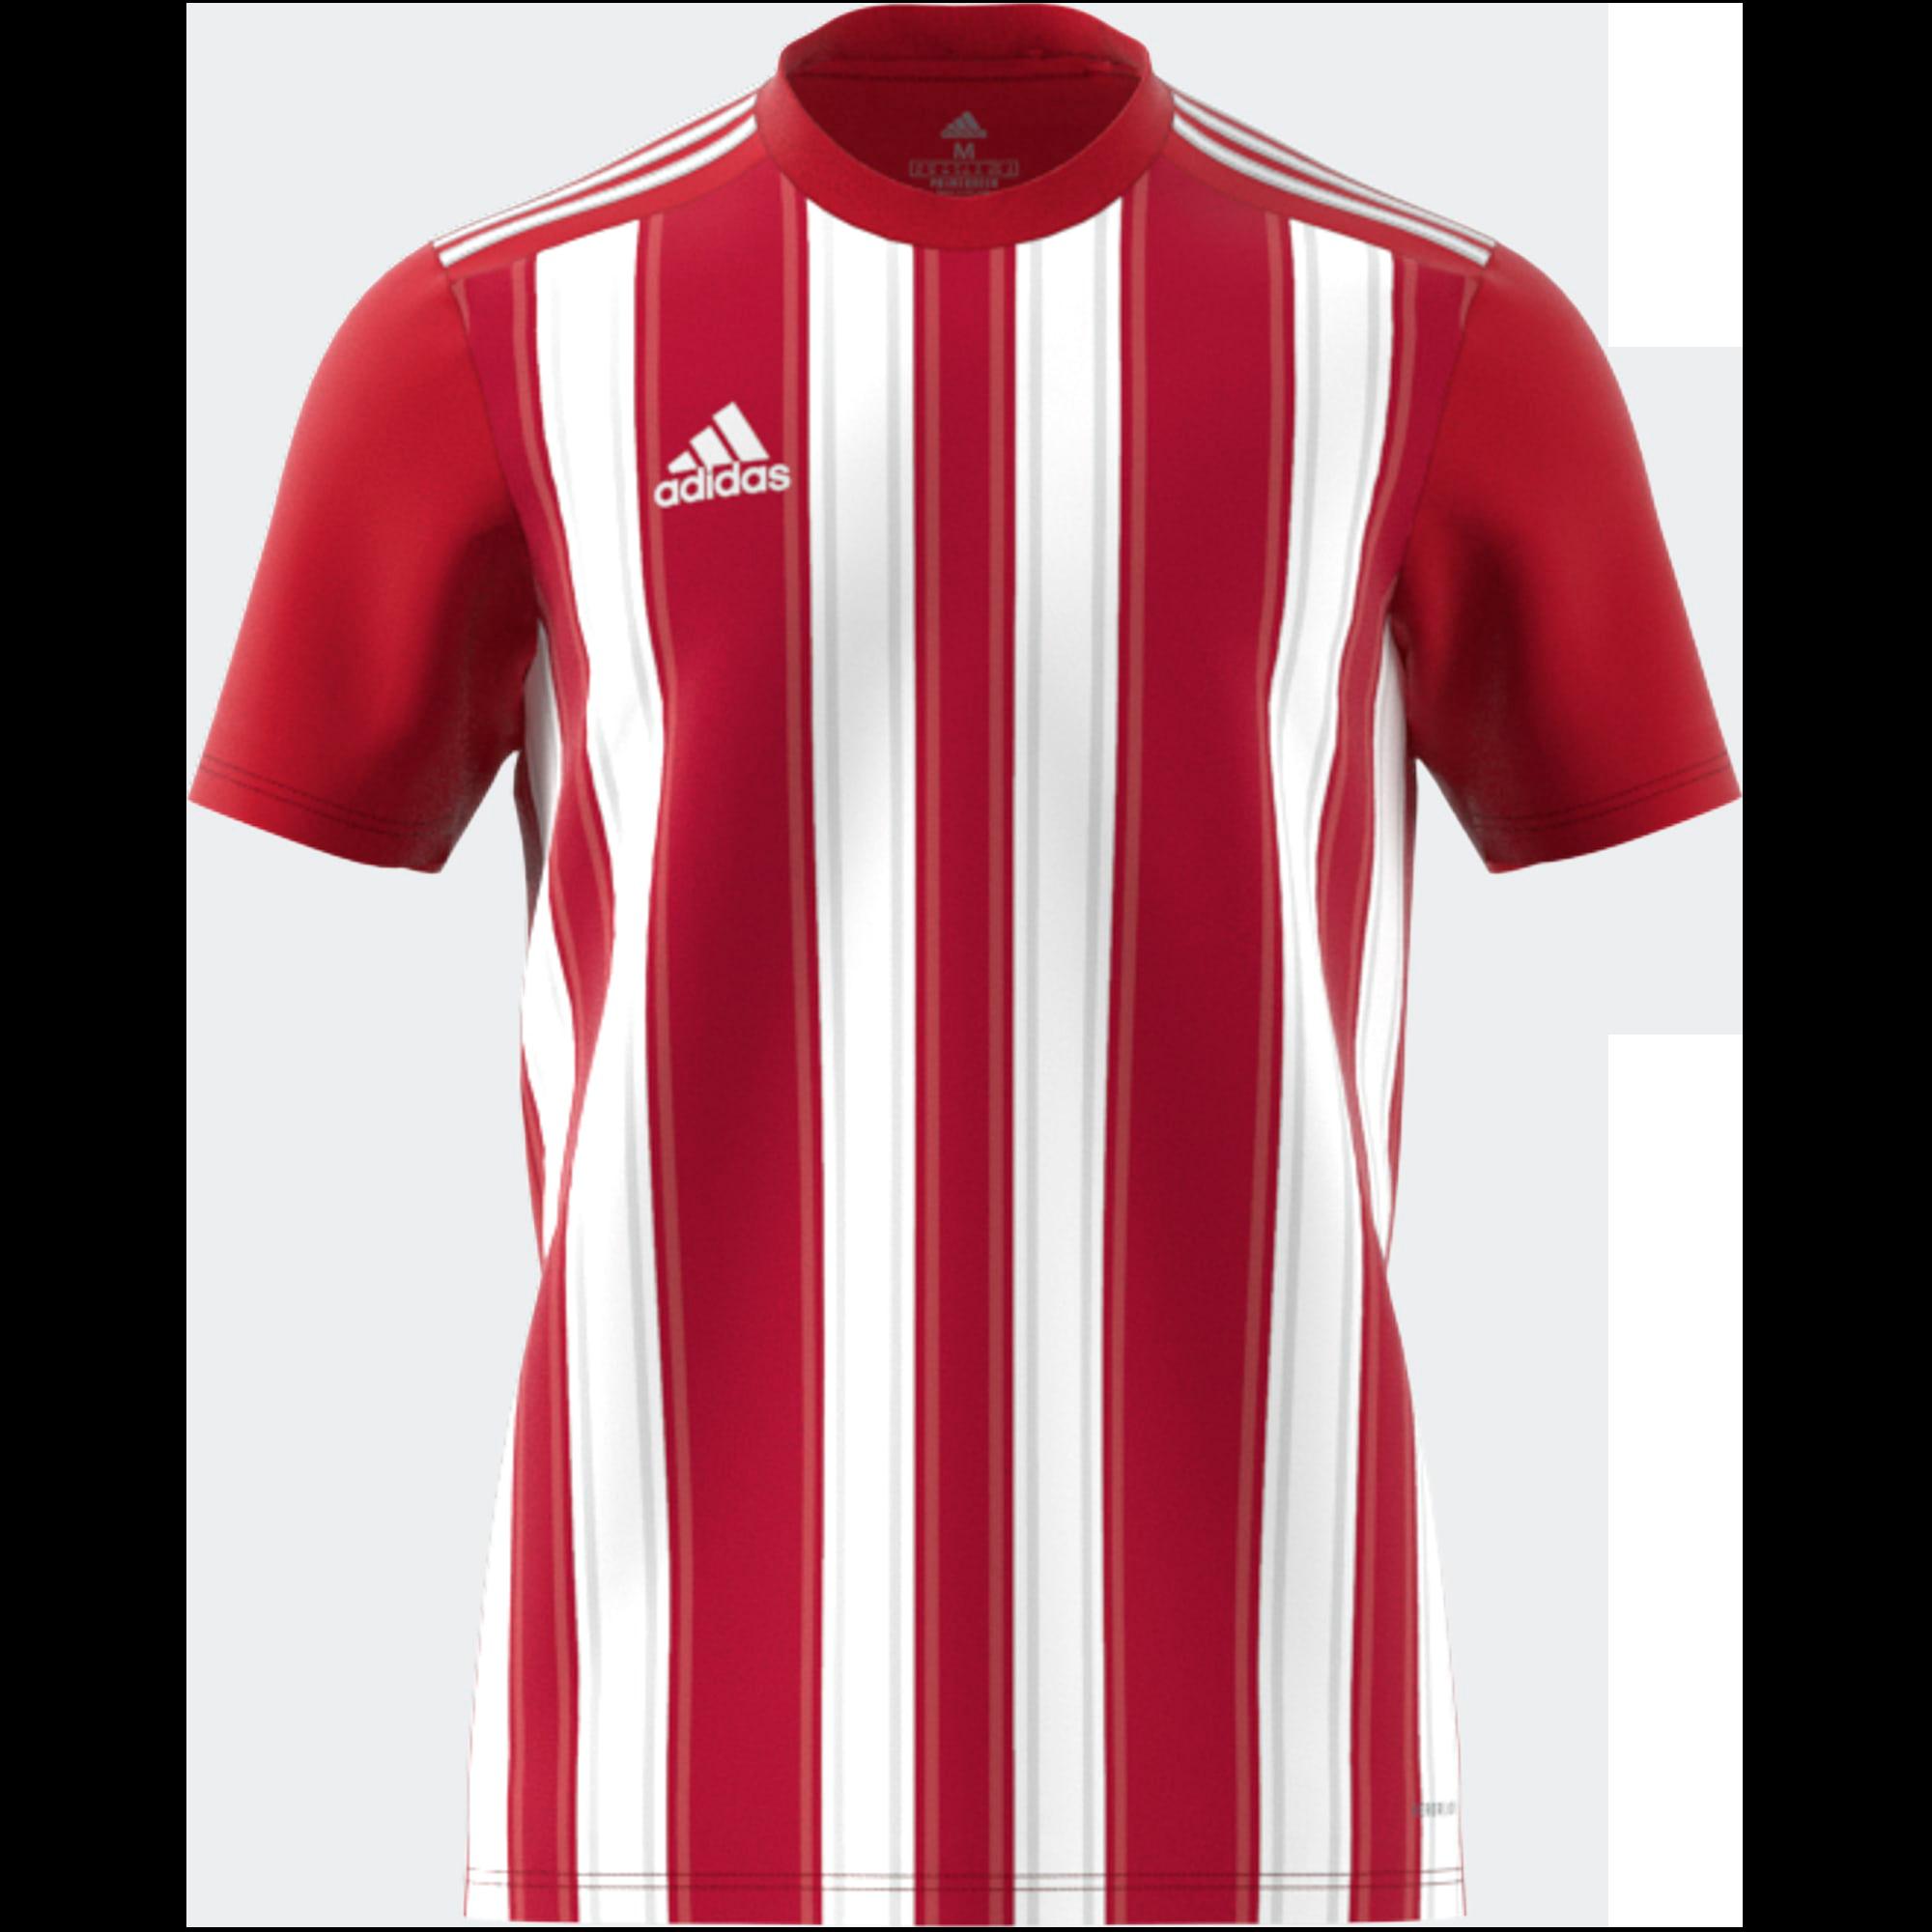 Adidas Striped 21 Jersey